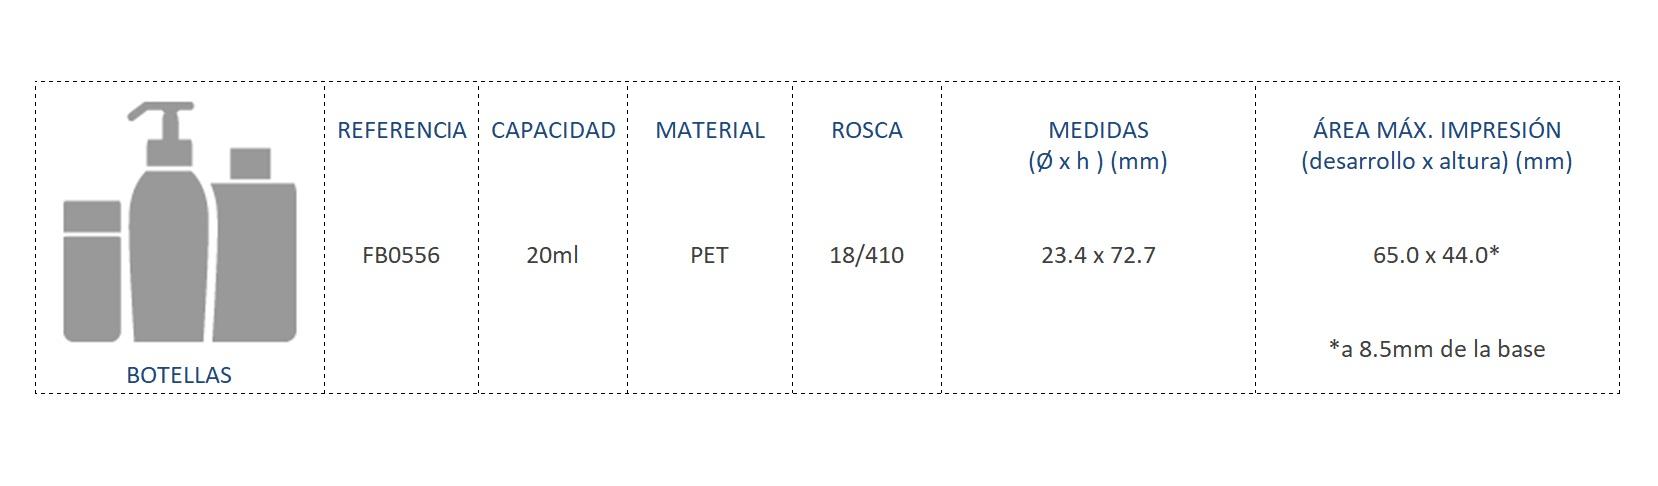 Cuadro de materiales FB0556